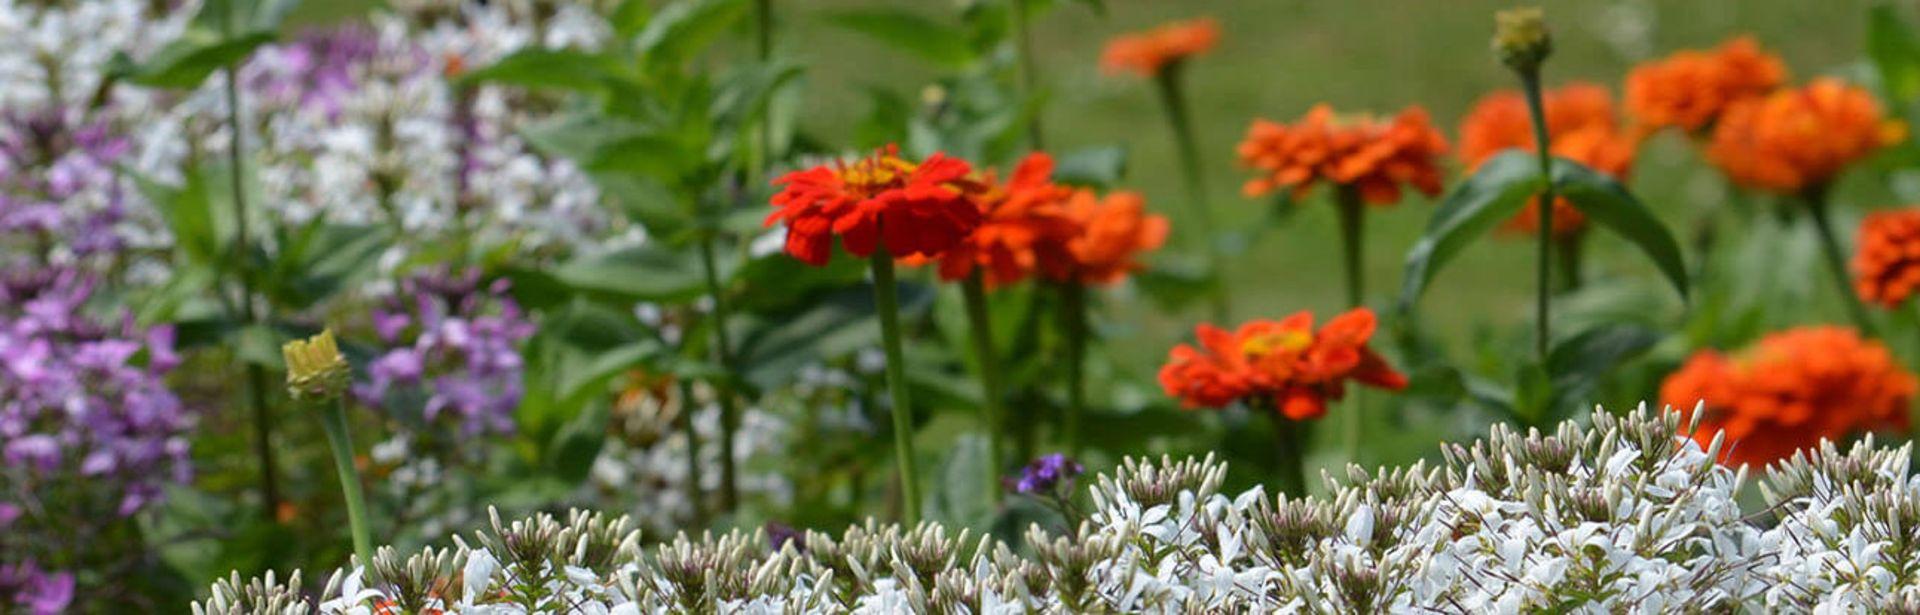 Buntes Blumenbeet im Kurpark